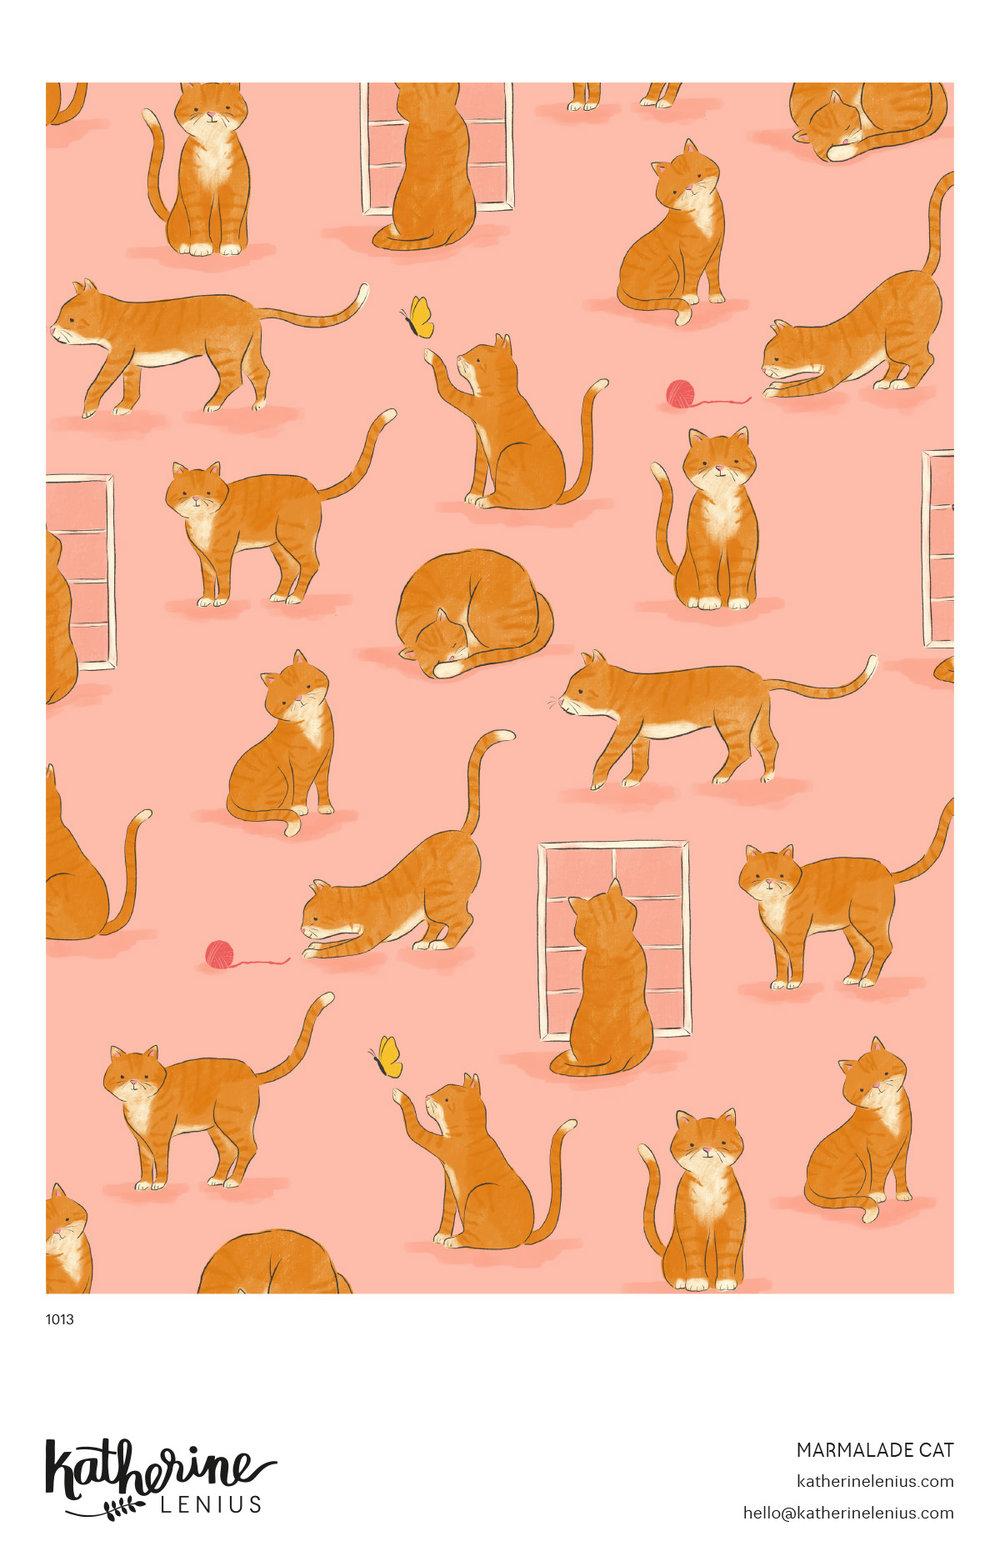 KL_1013_Marmalade Cat copy.jpg